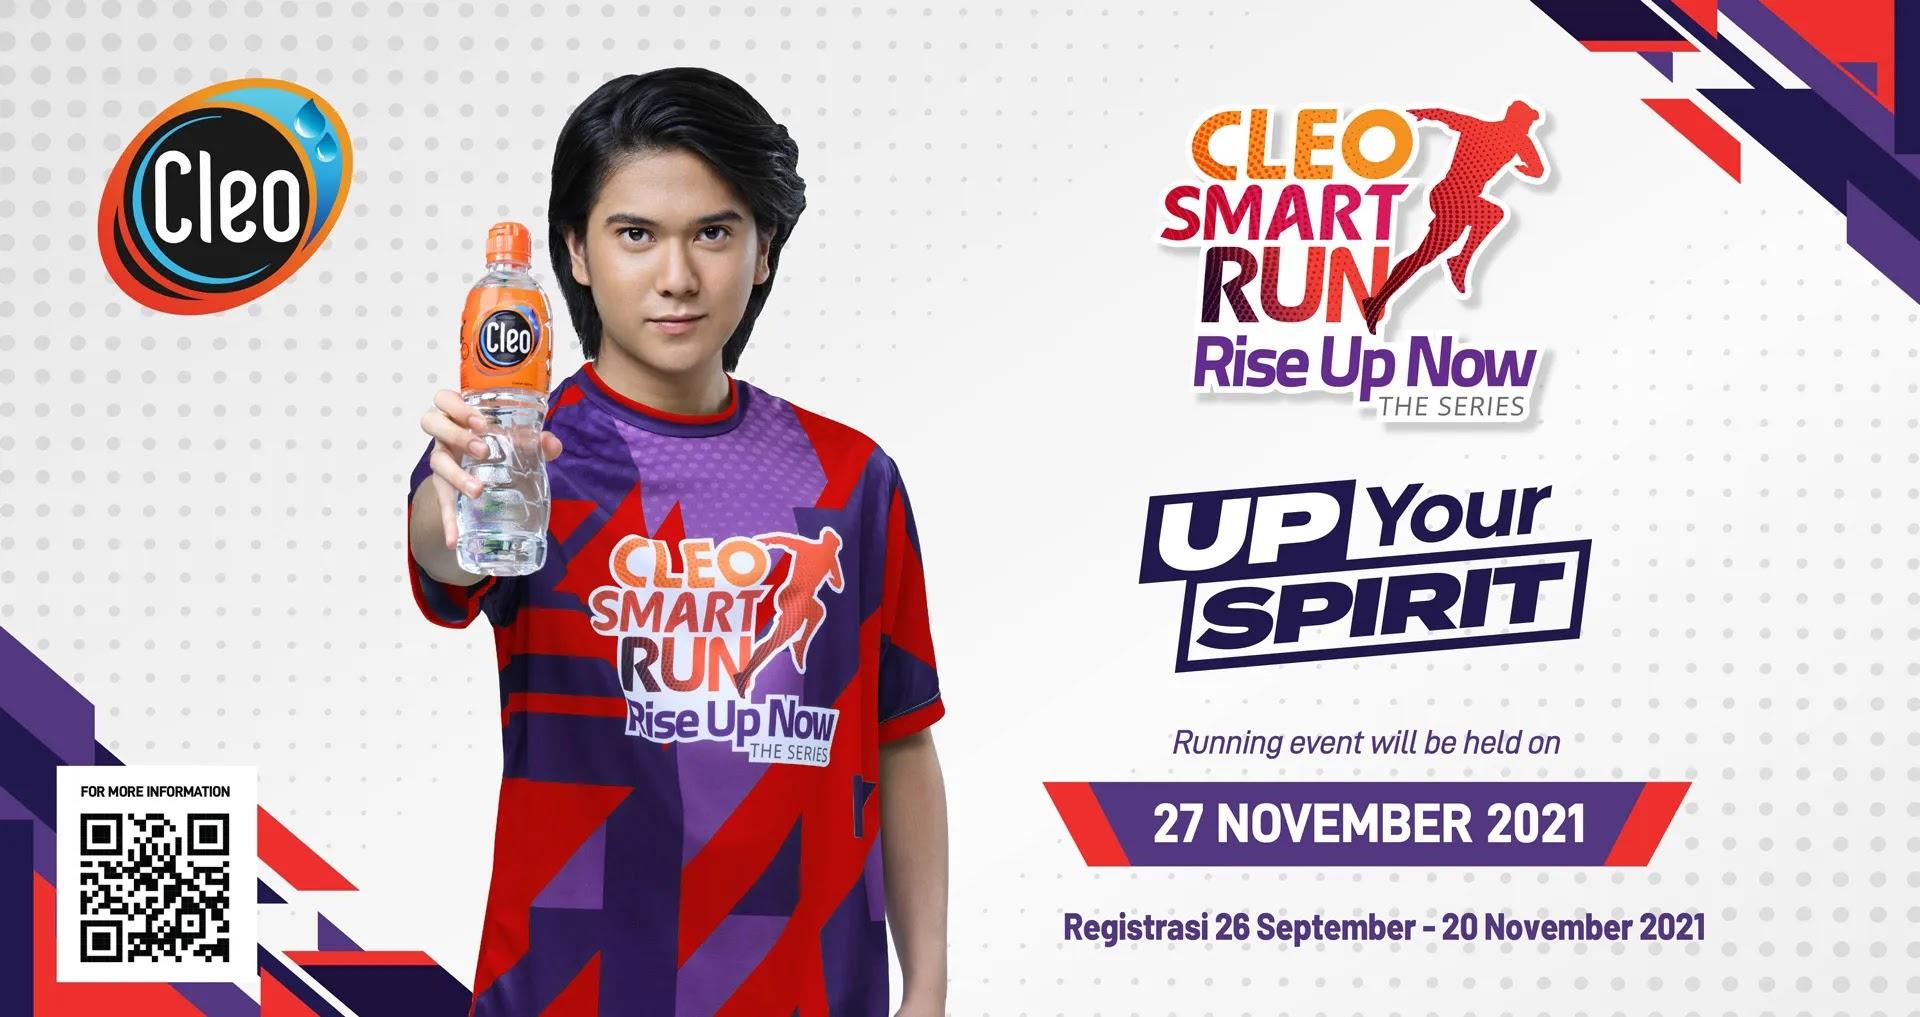 Cleo Smart Run - Up Your Spirit • 2021